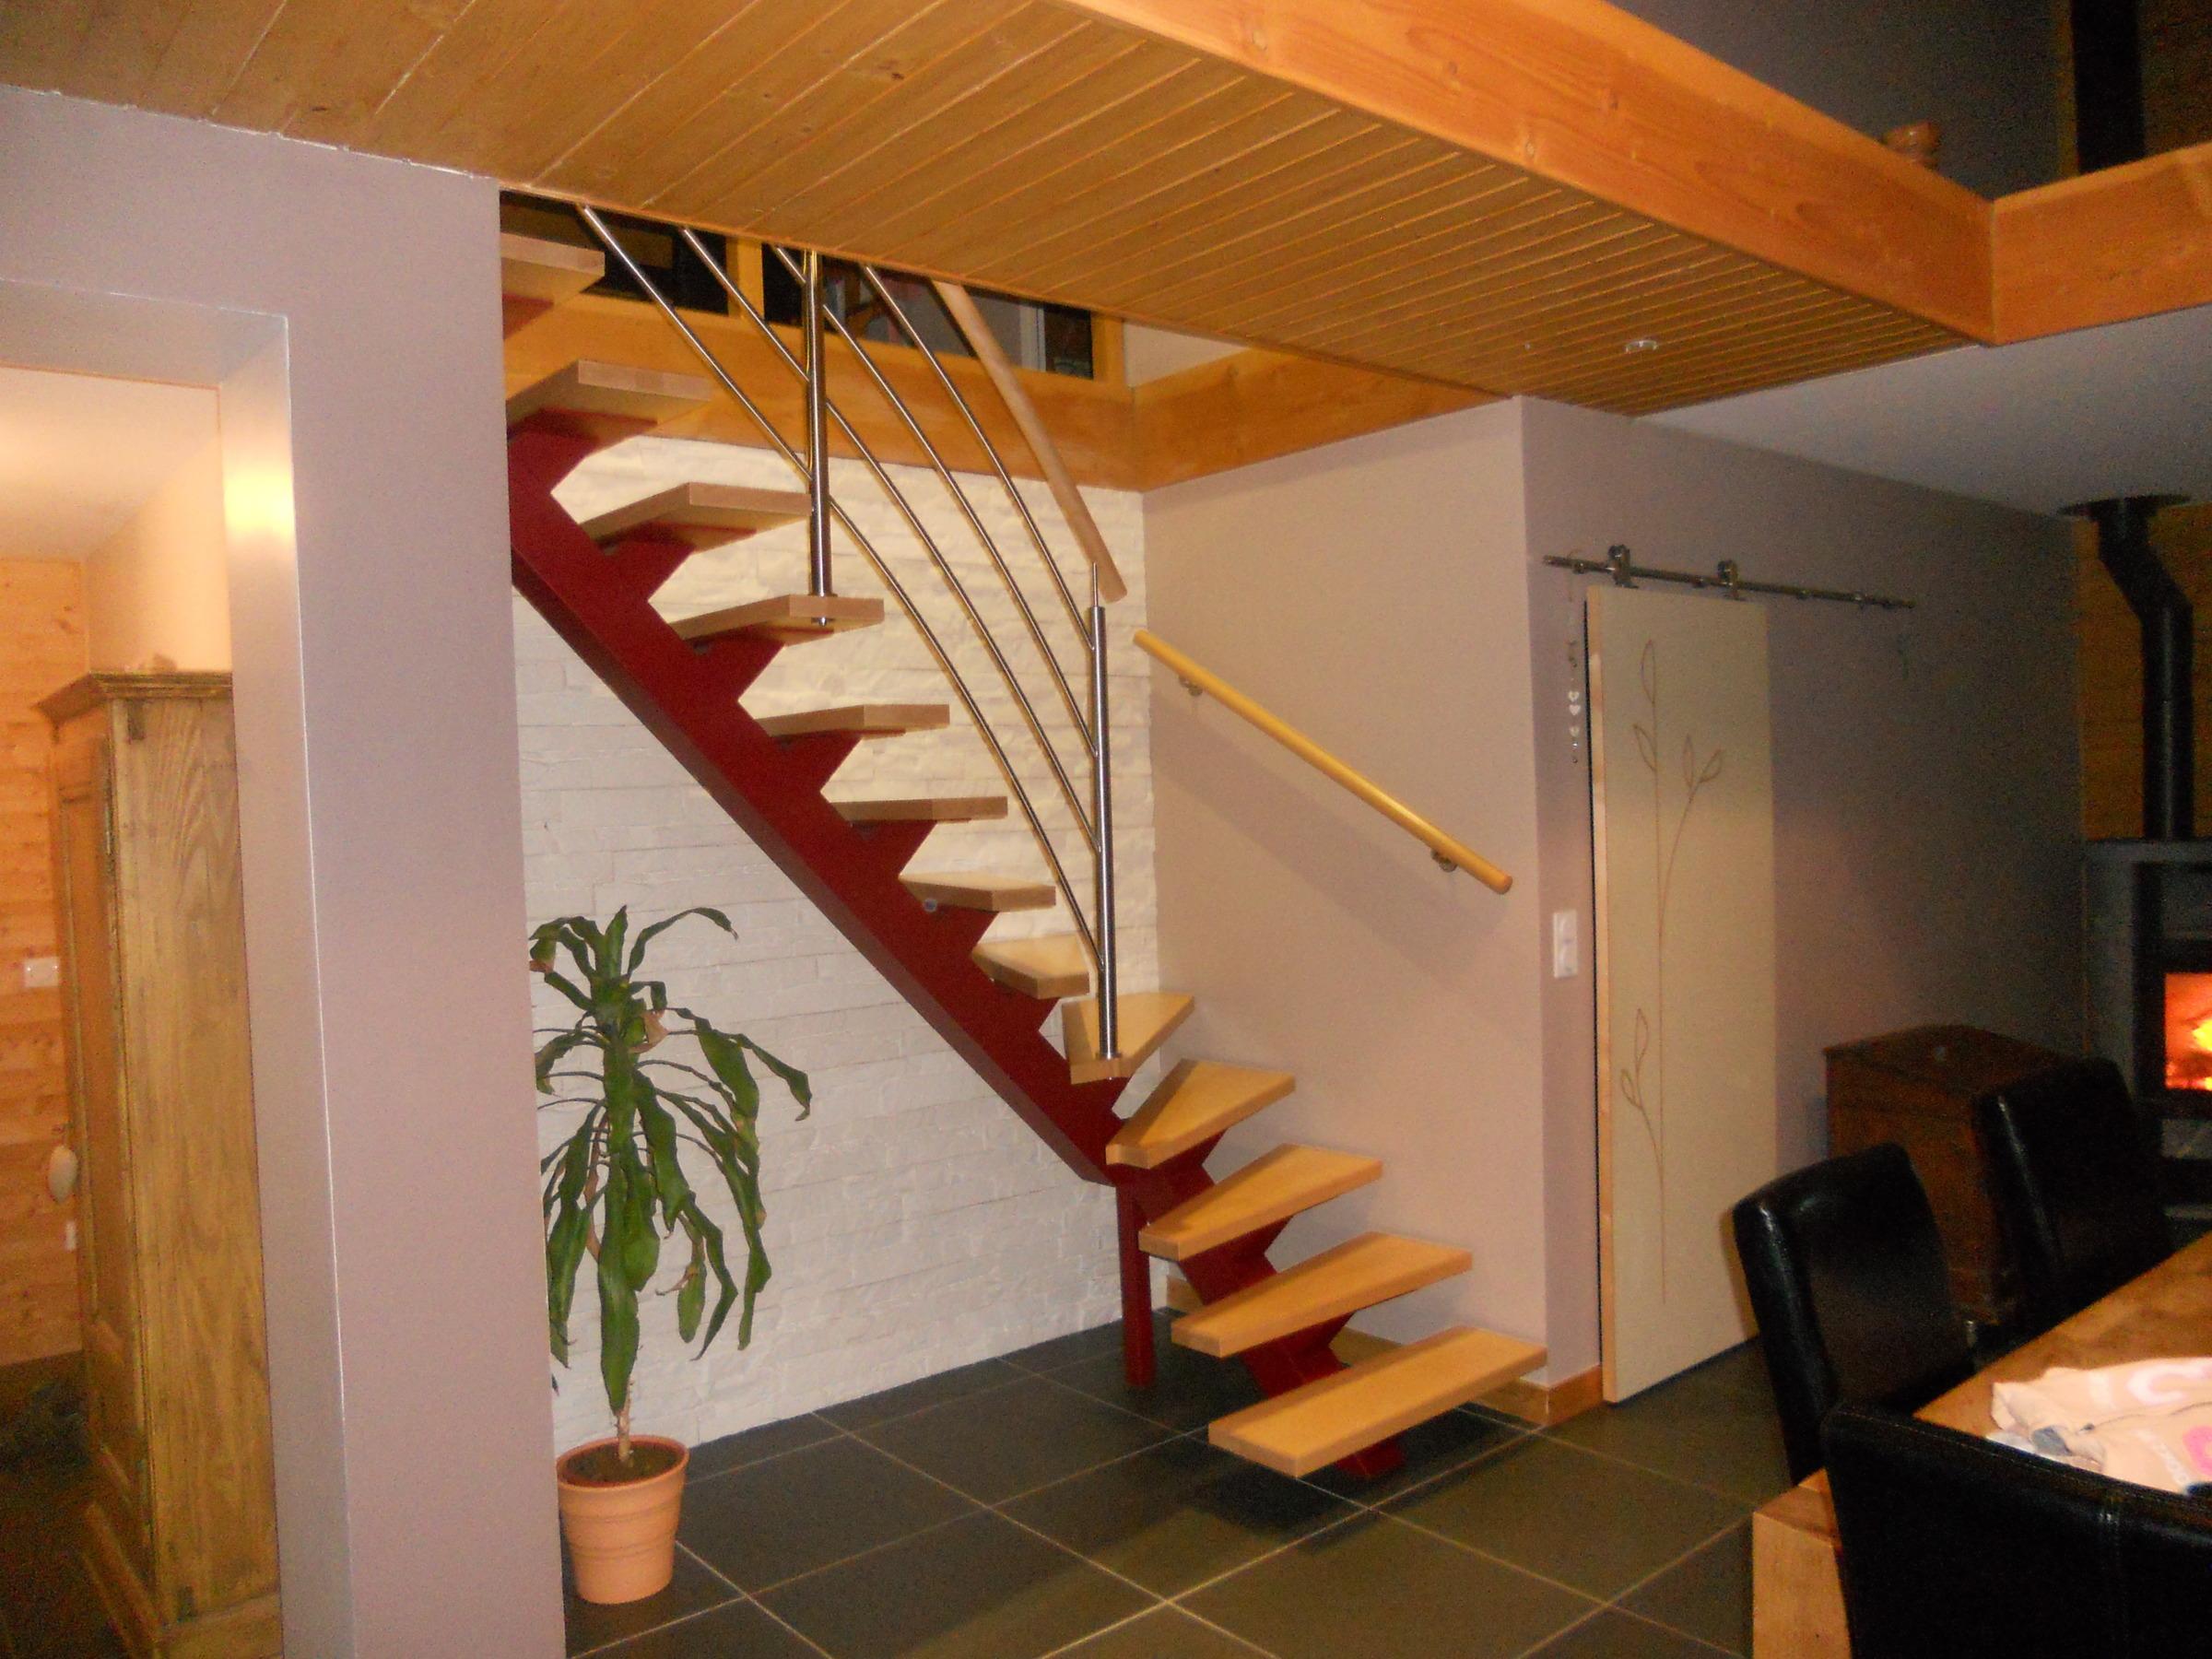 Escalier Et Balustrade Sur Mesure Jura Pernin